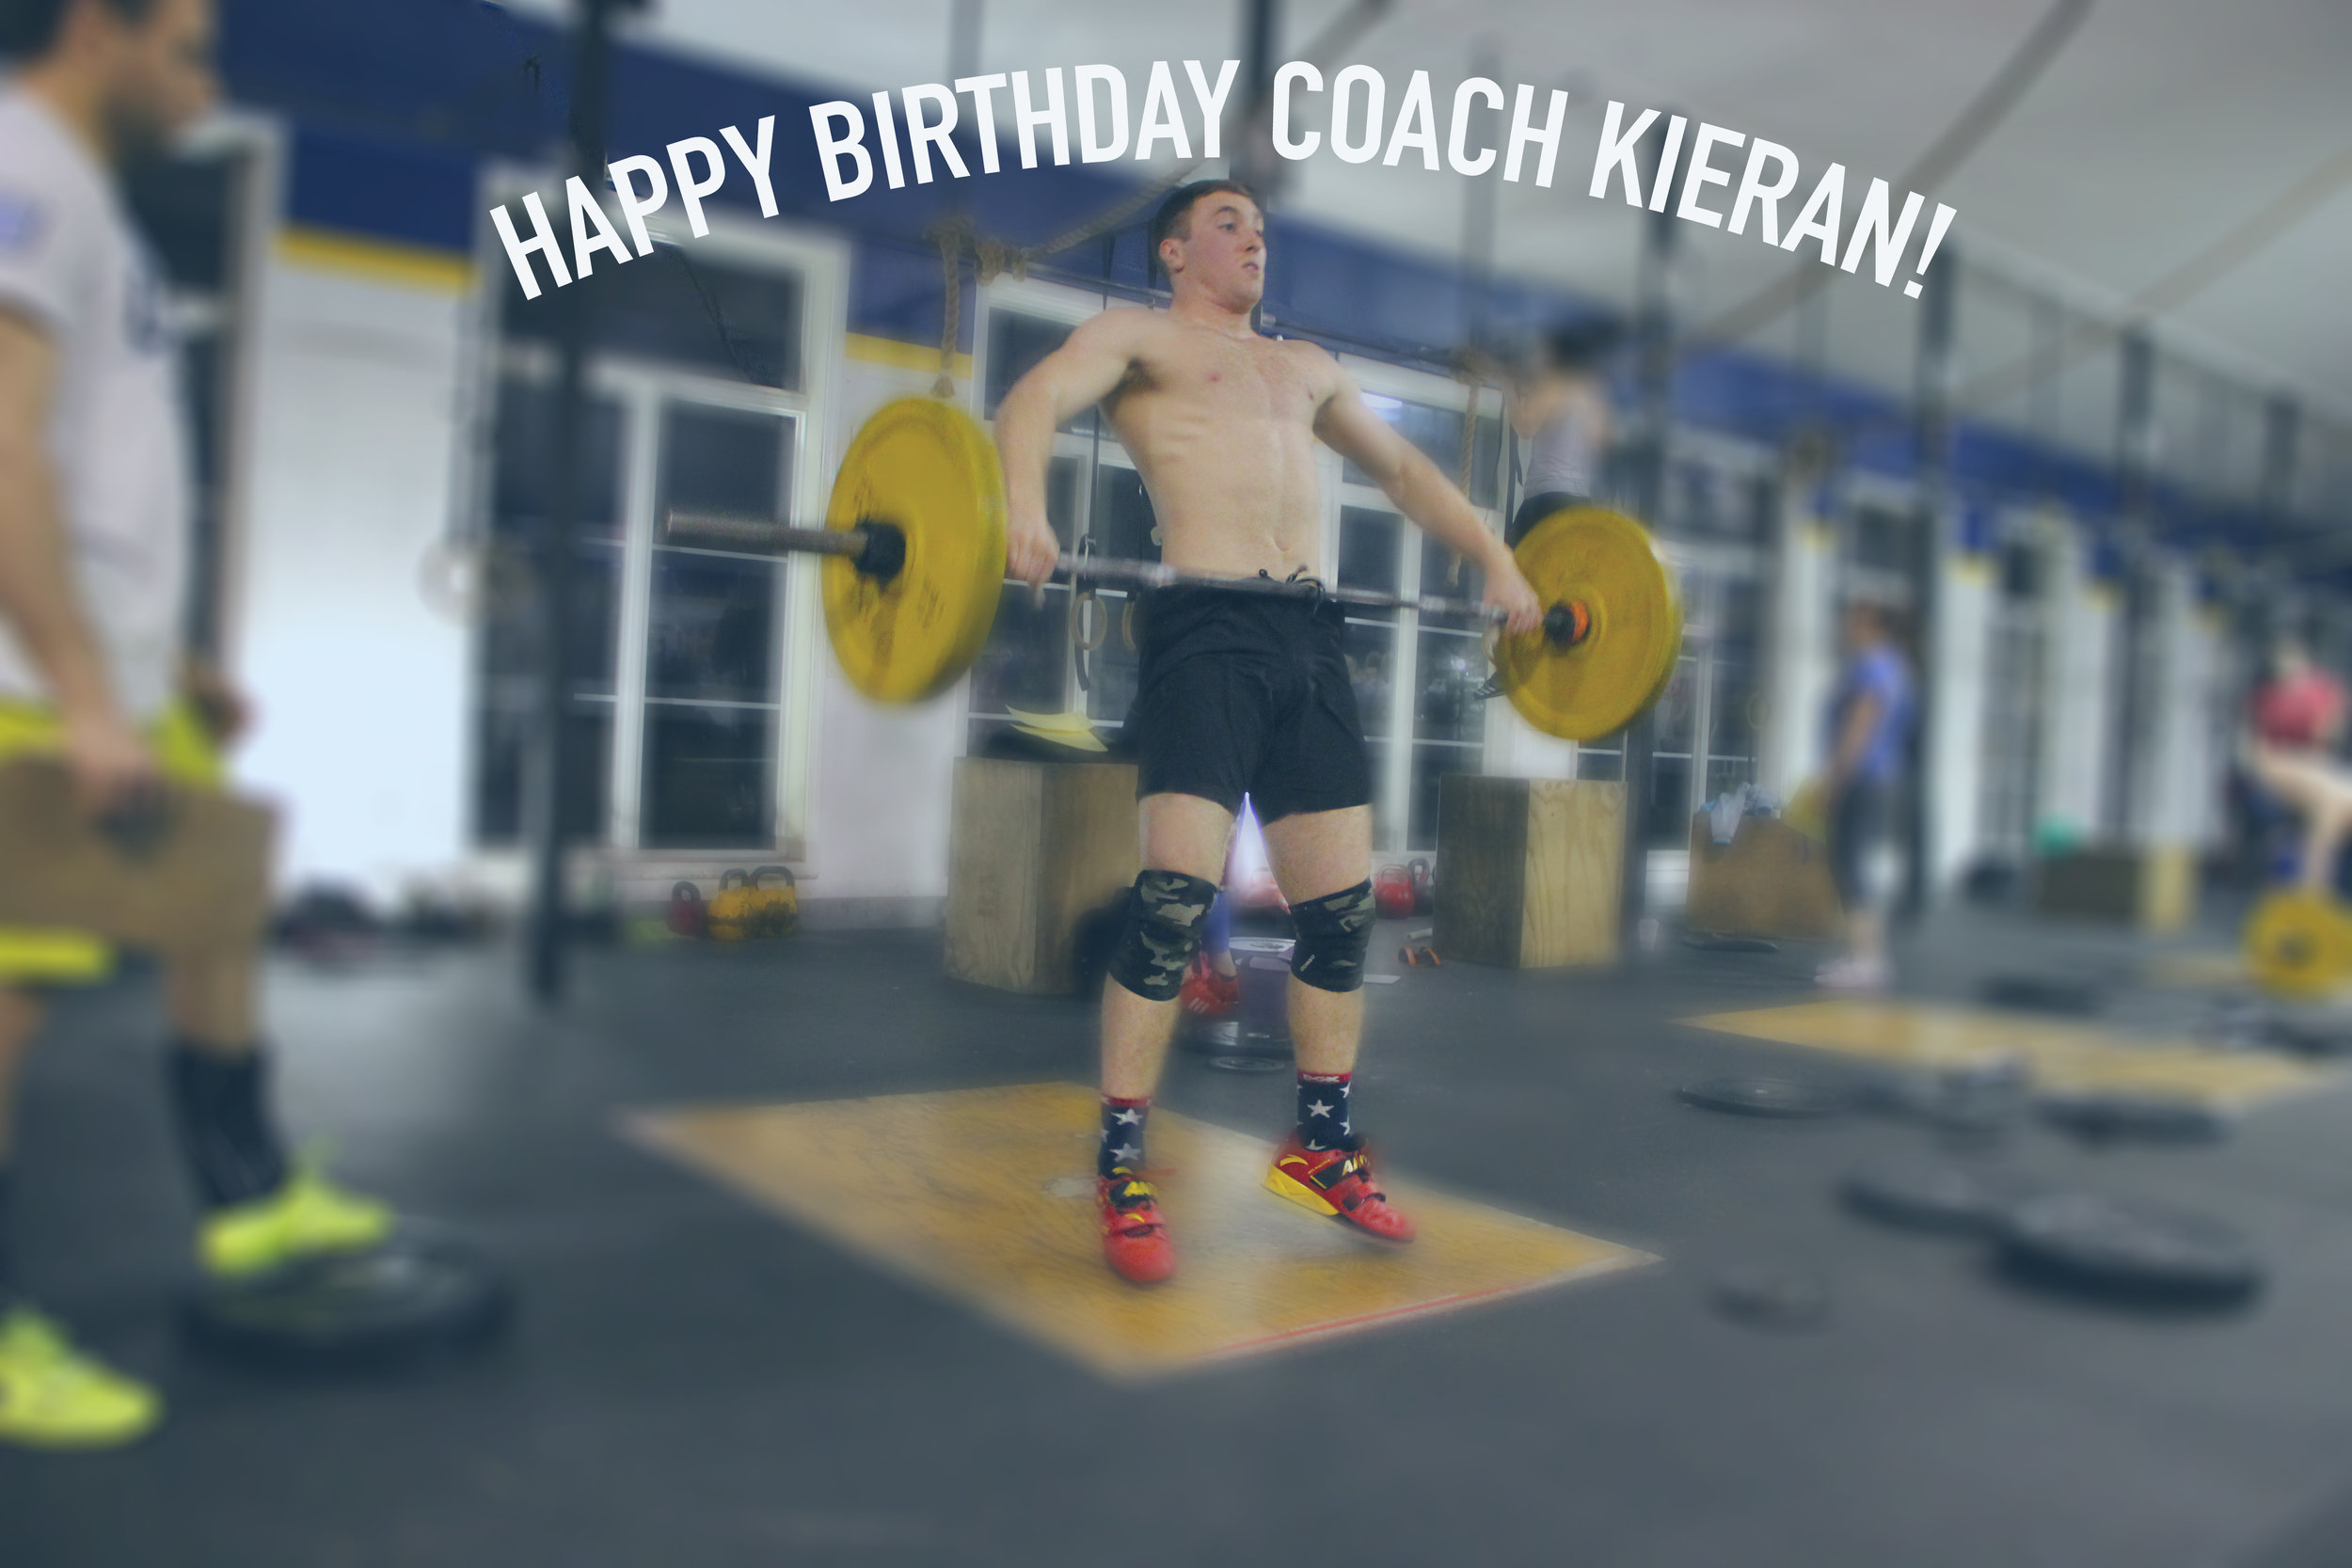 Here's a Great Big Birthday Hug for Coach Kieran!